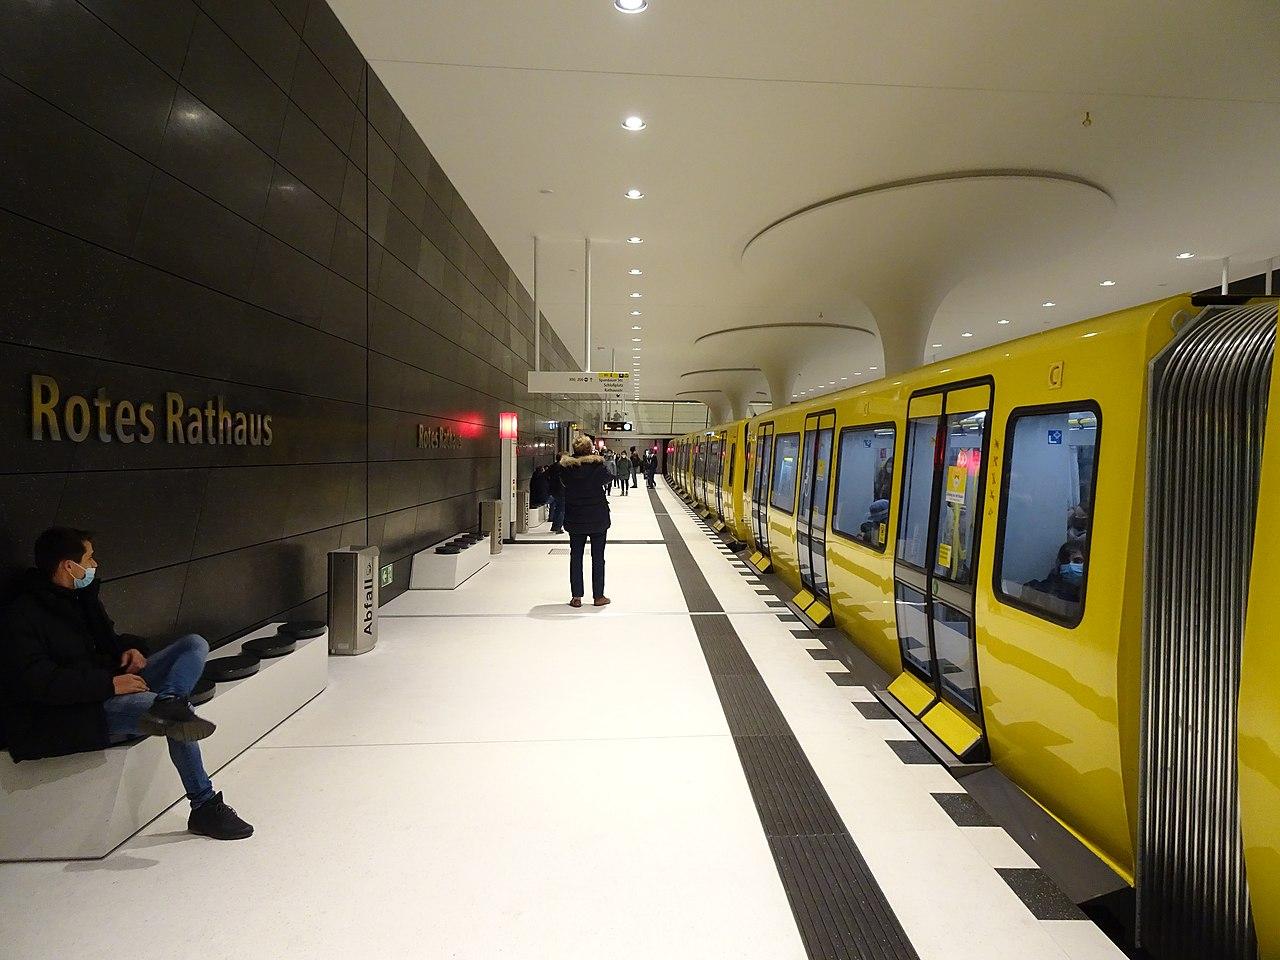 U-Bahnhof Rotes Rathaus (50688176686).jpg